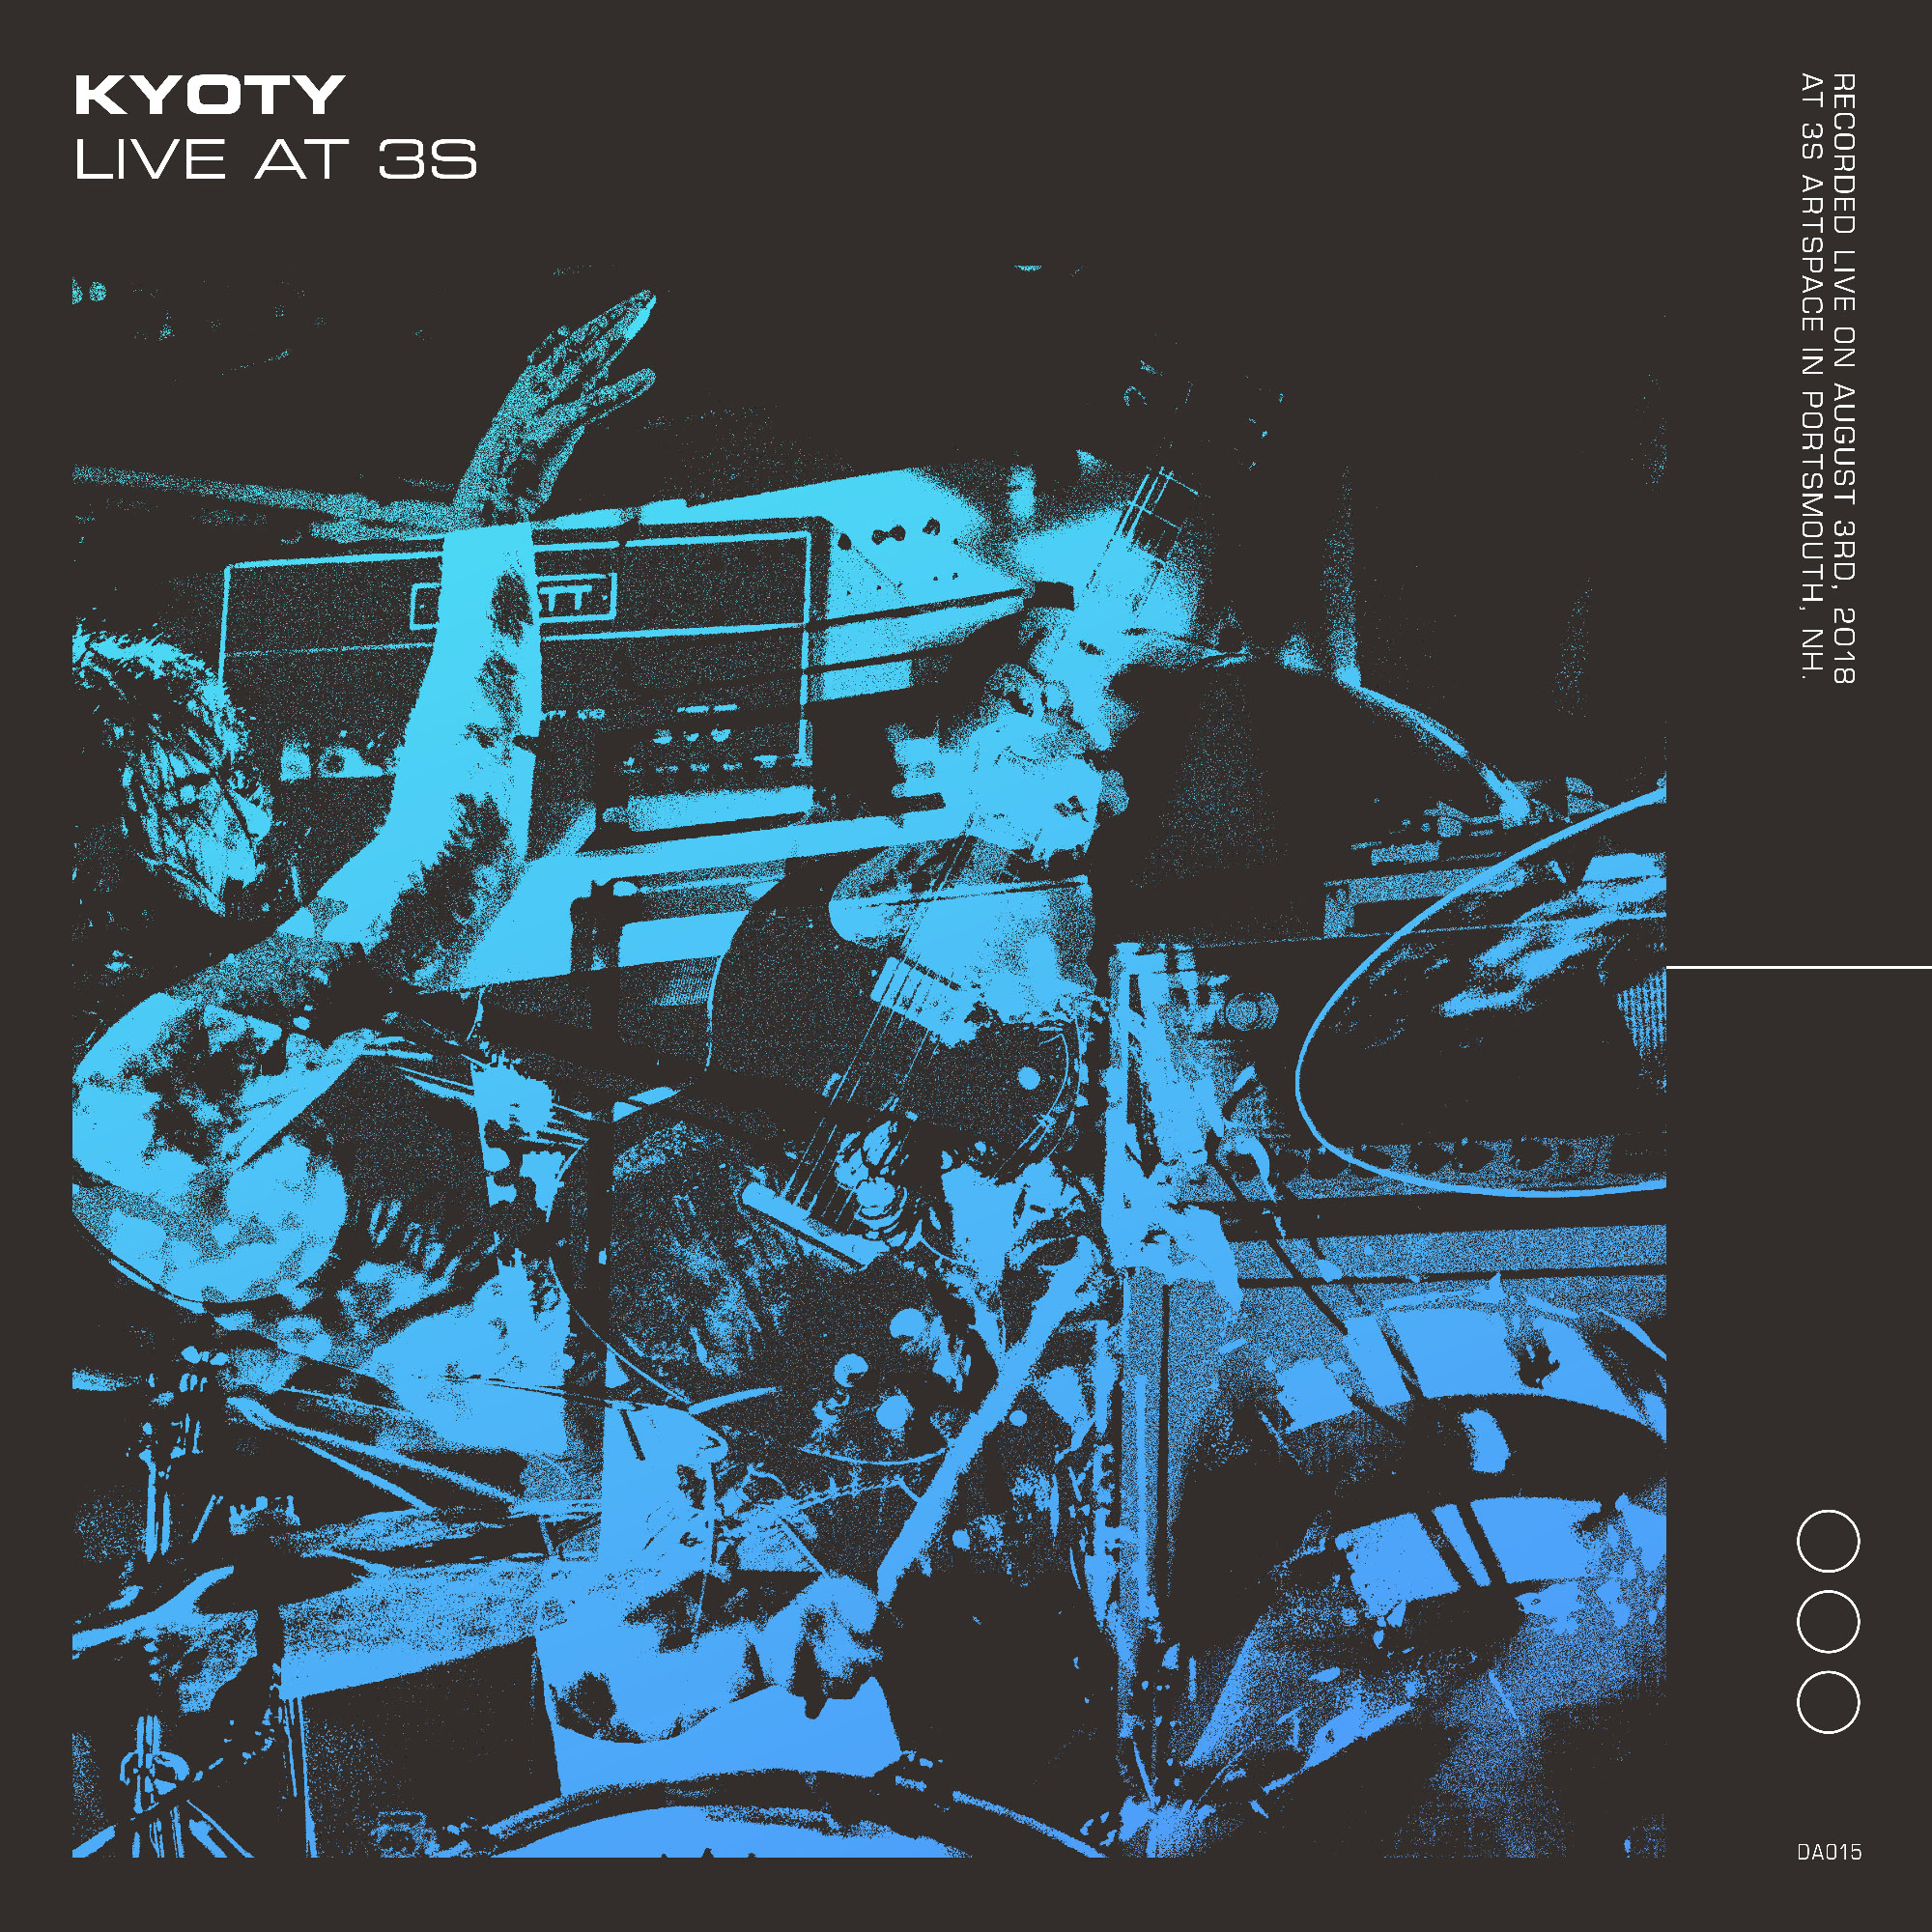 kyoty live-at-3s-full